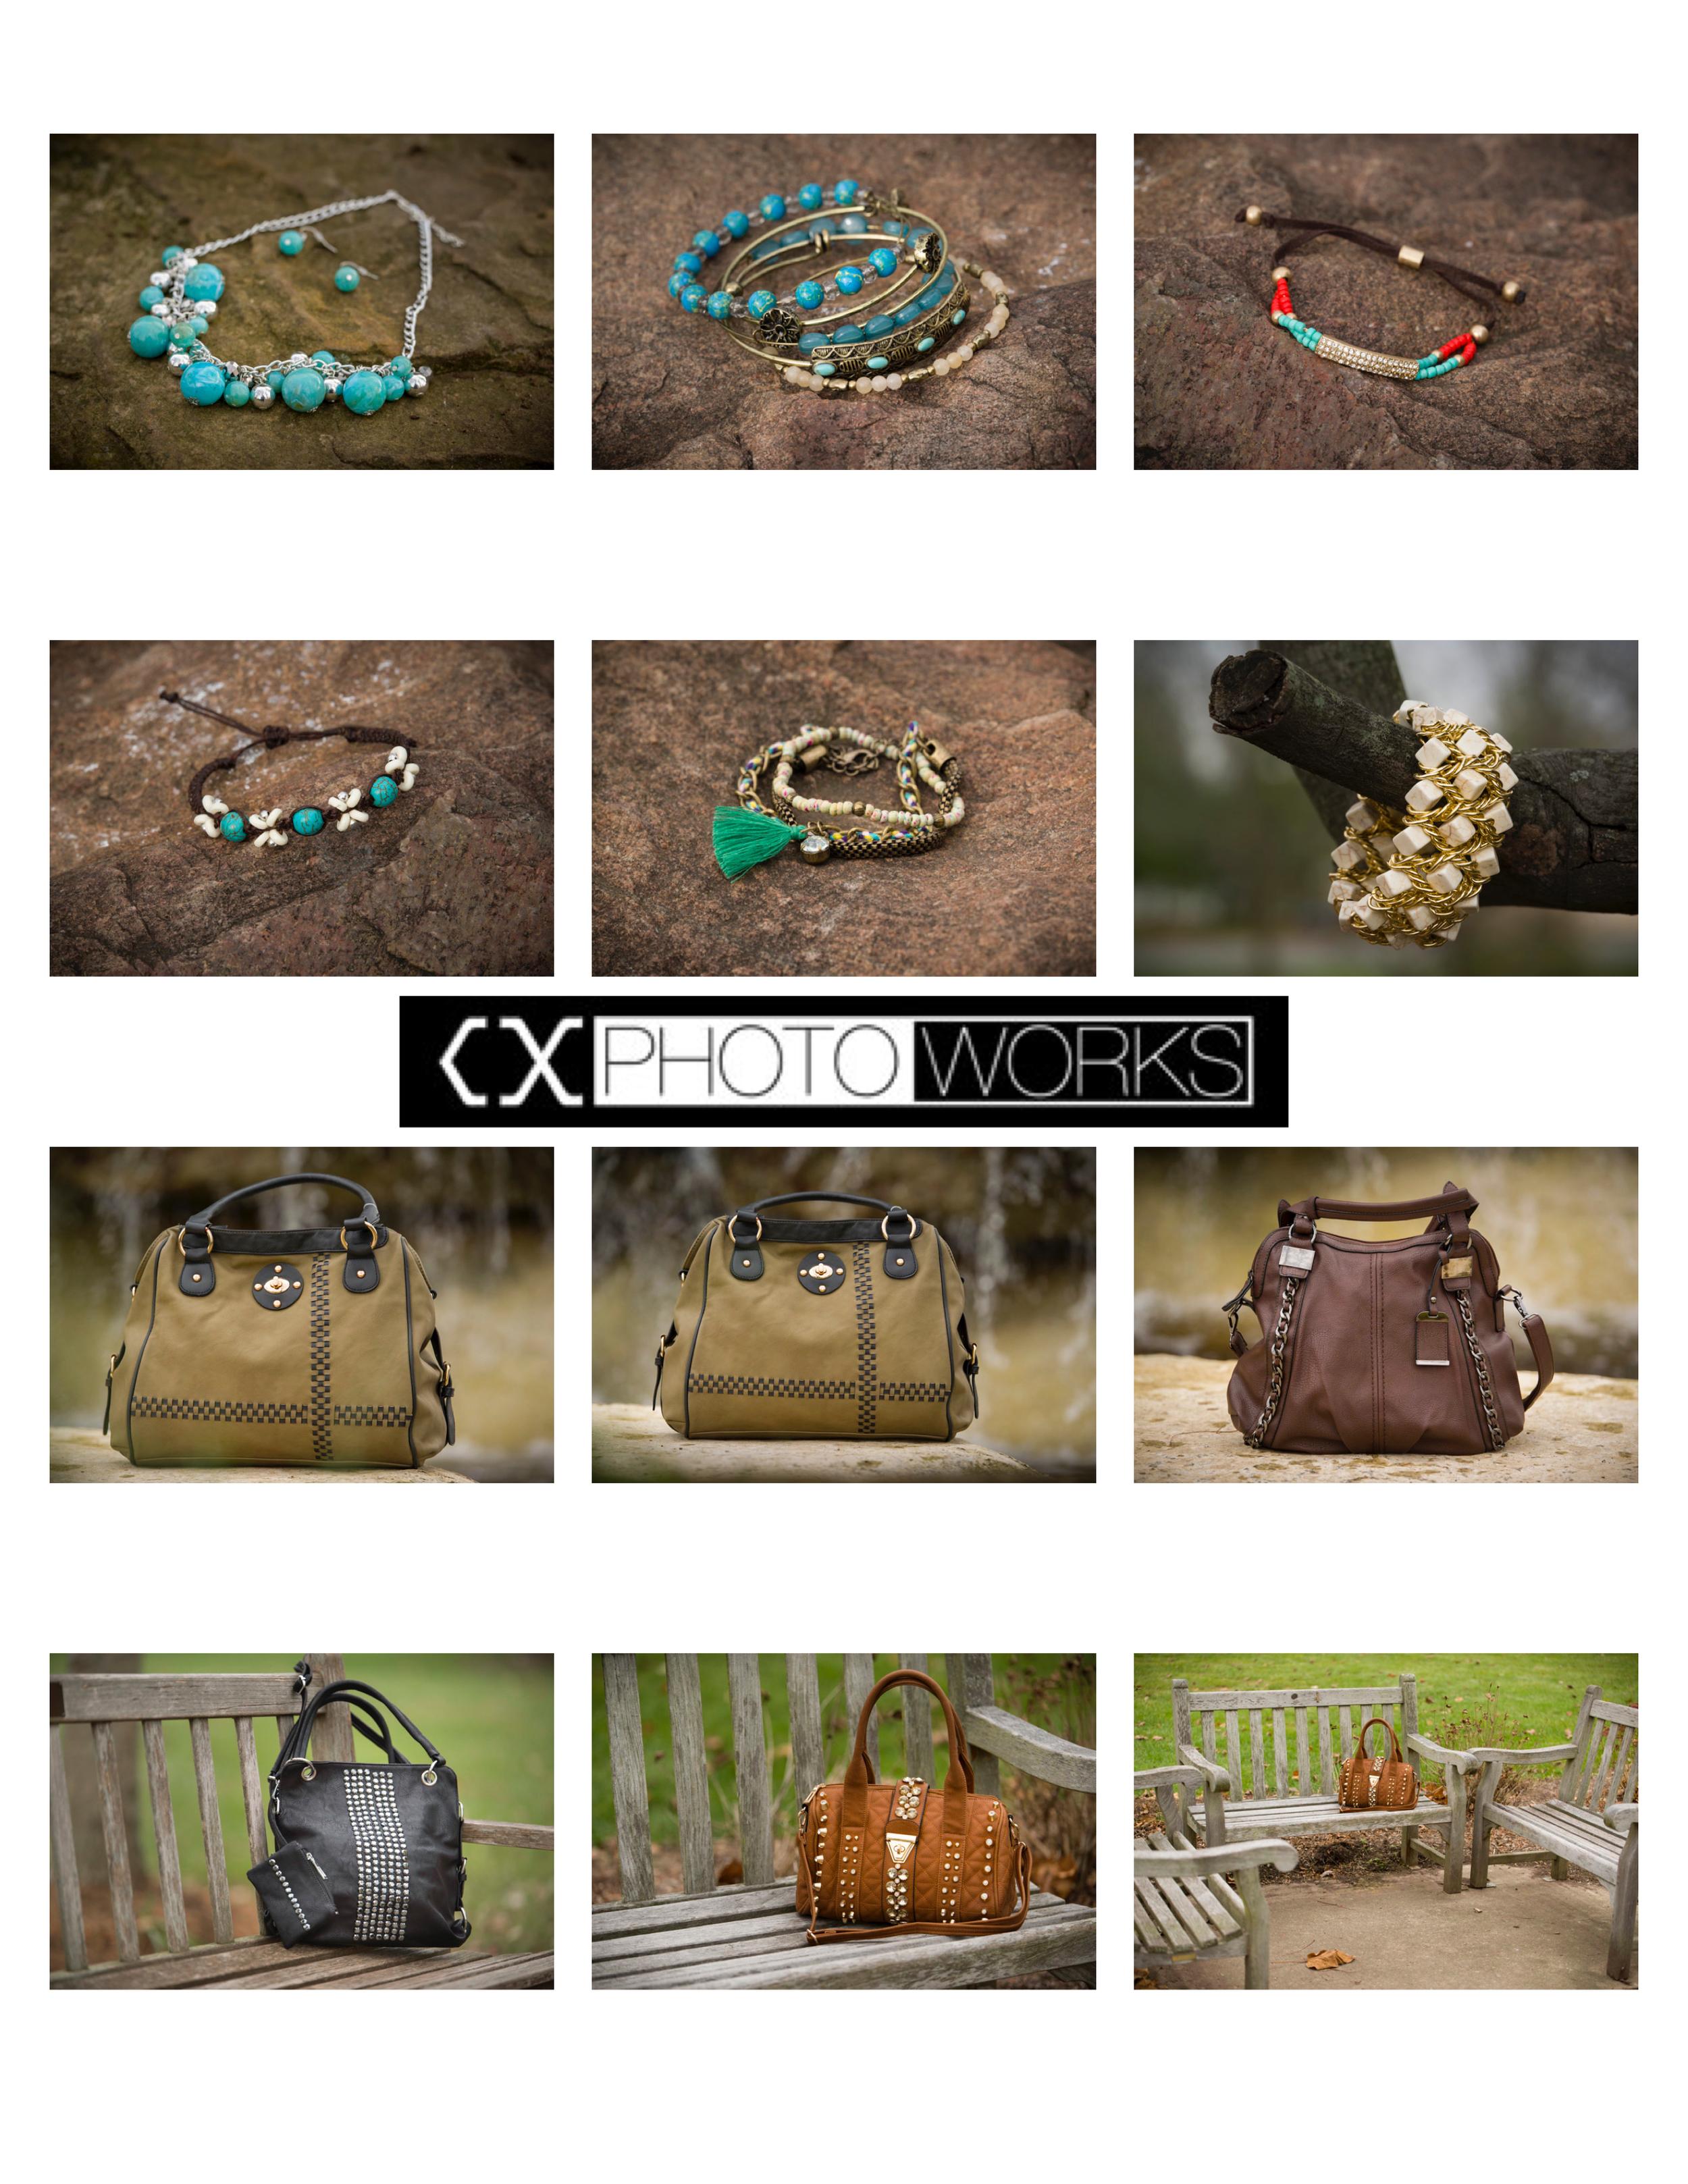 Fashion Accessories: Jewelry & Handbags (Contact Sheet 1)